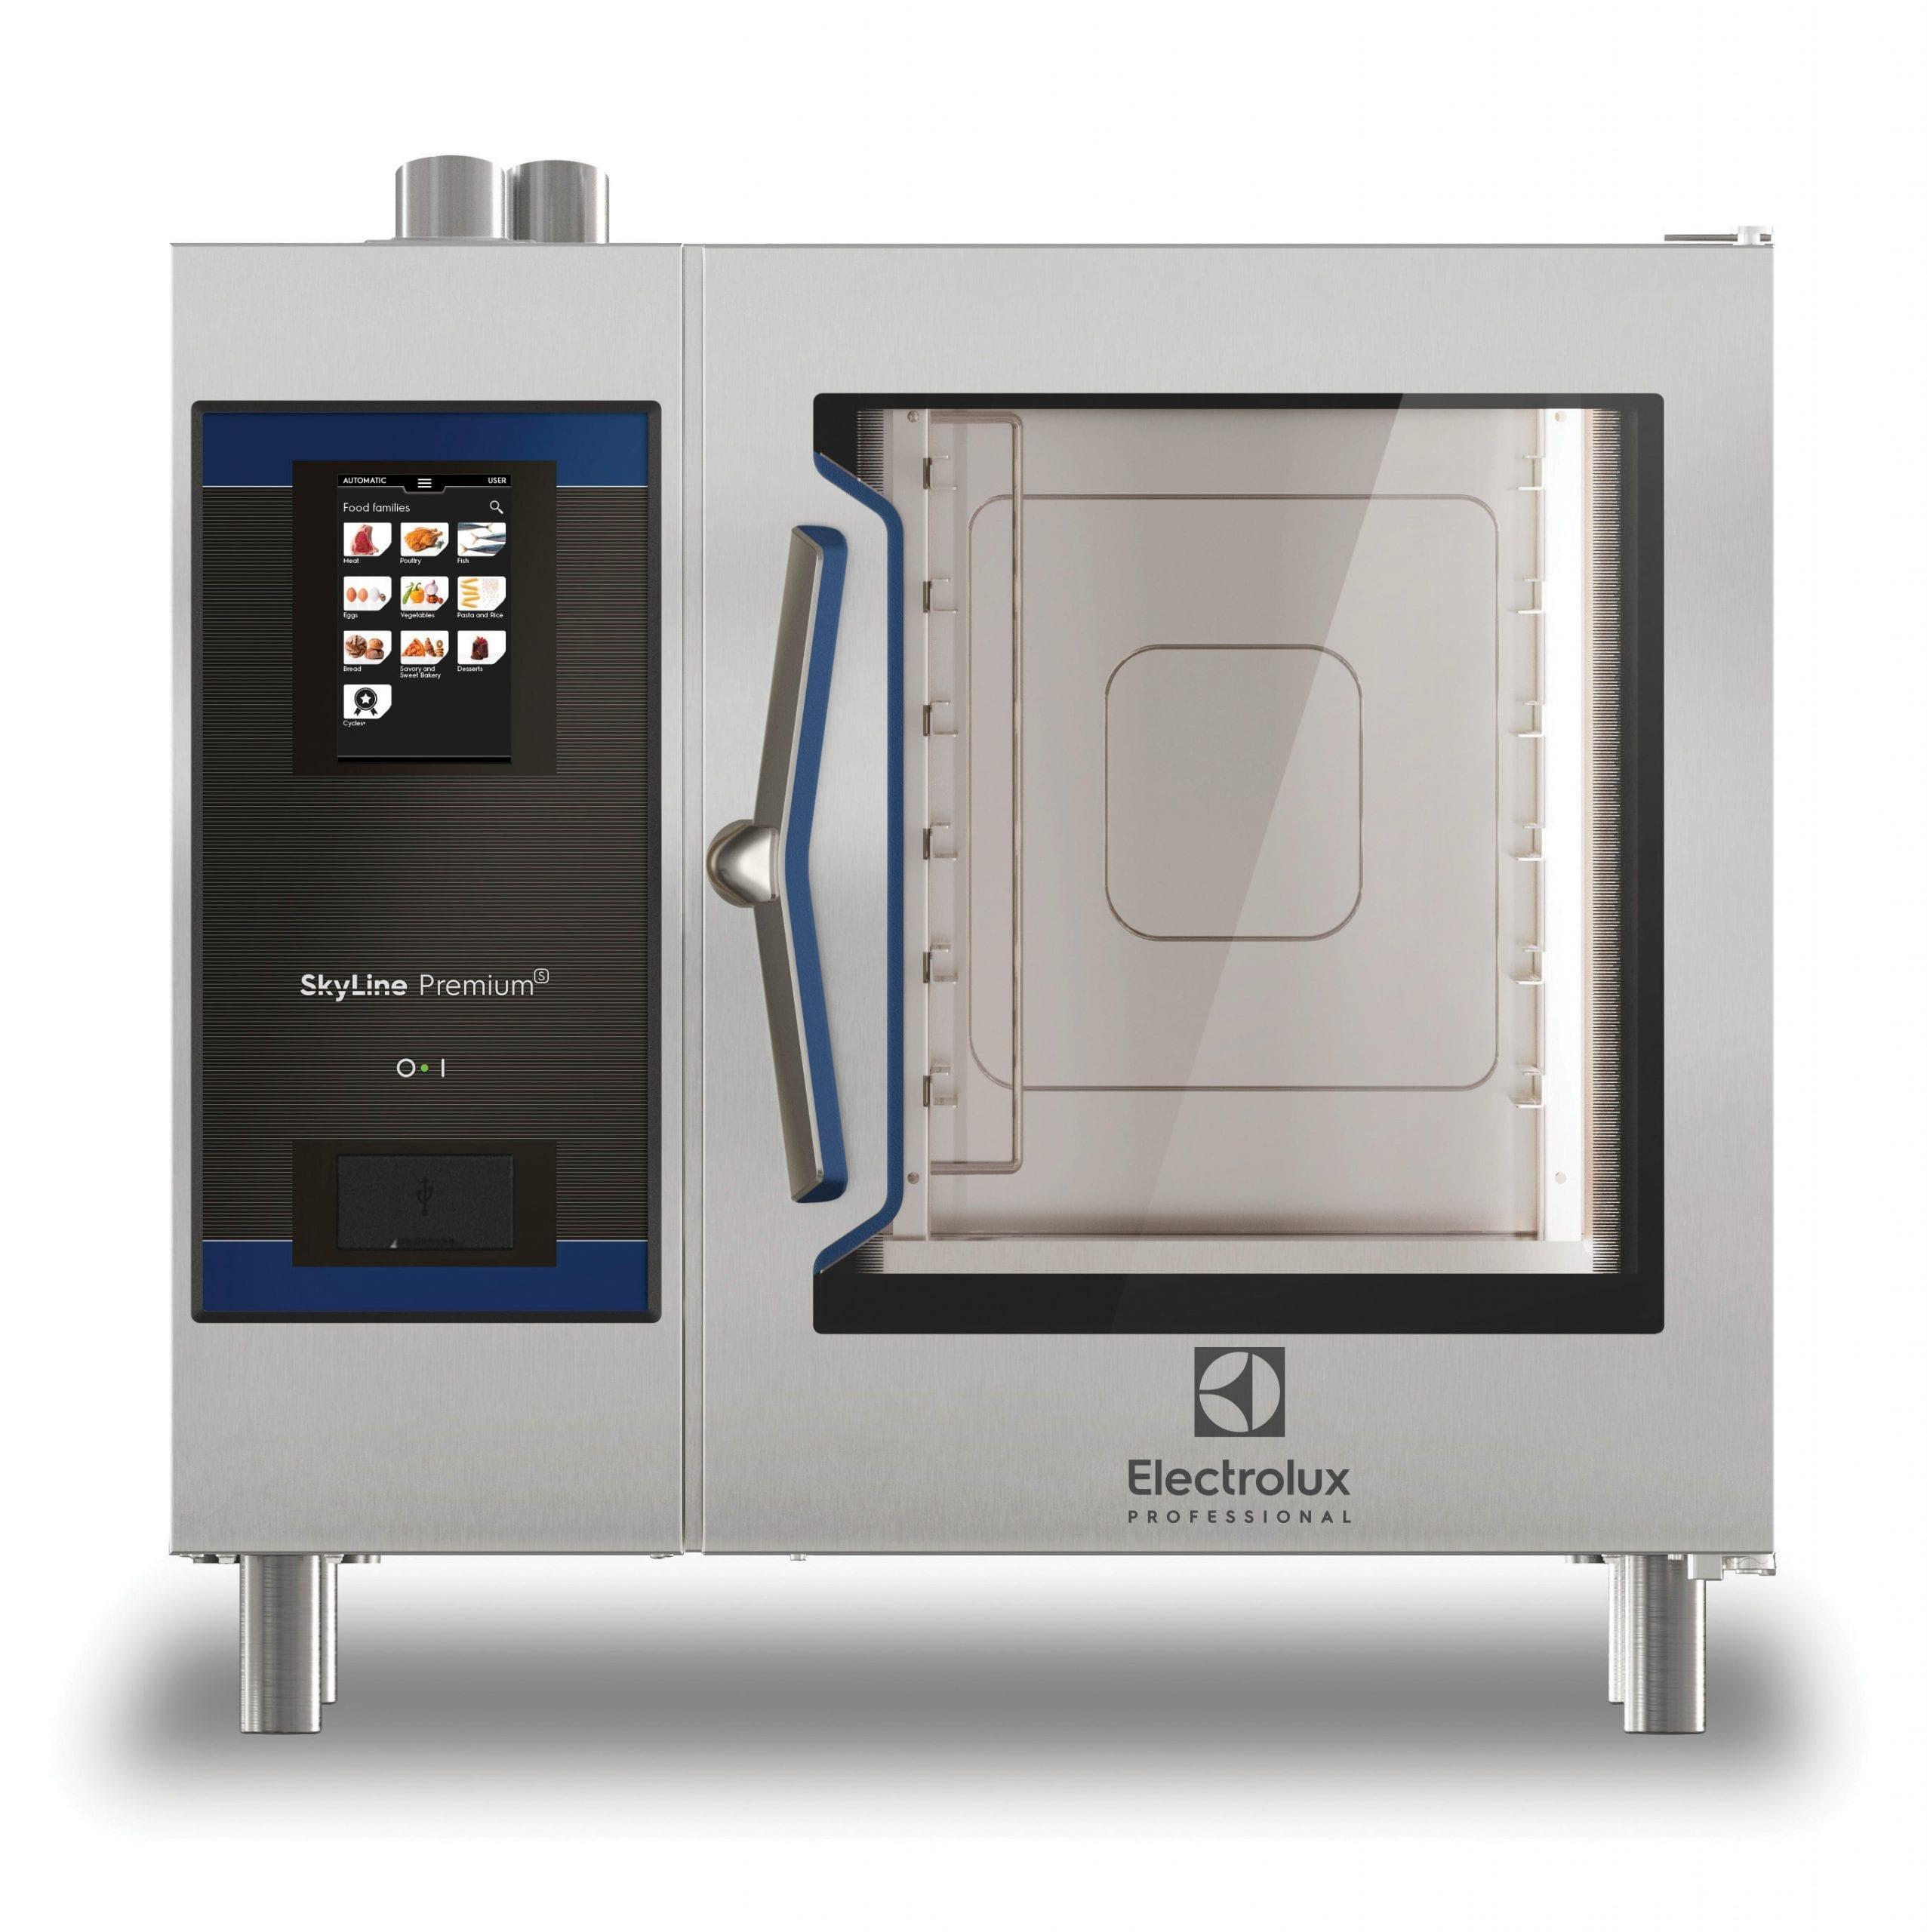 Combi Oven Skyline Pro S 6 GN 2/1 Image